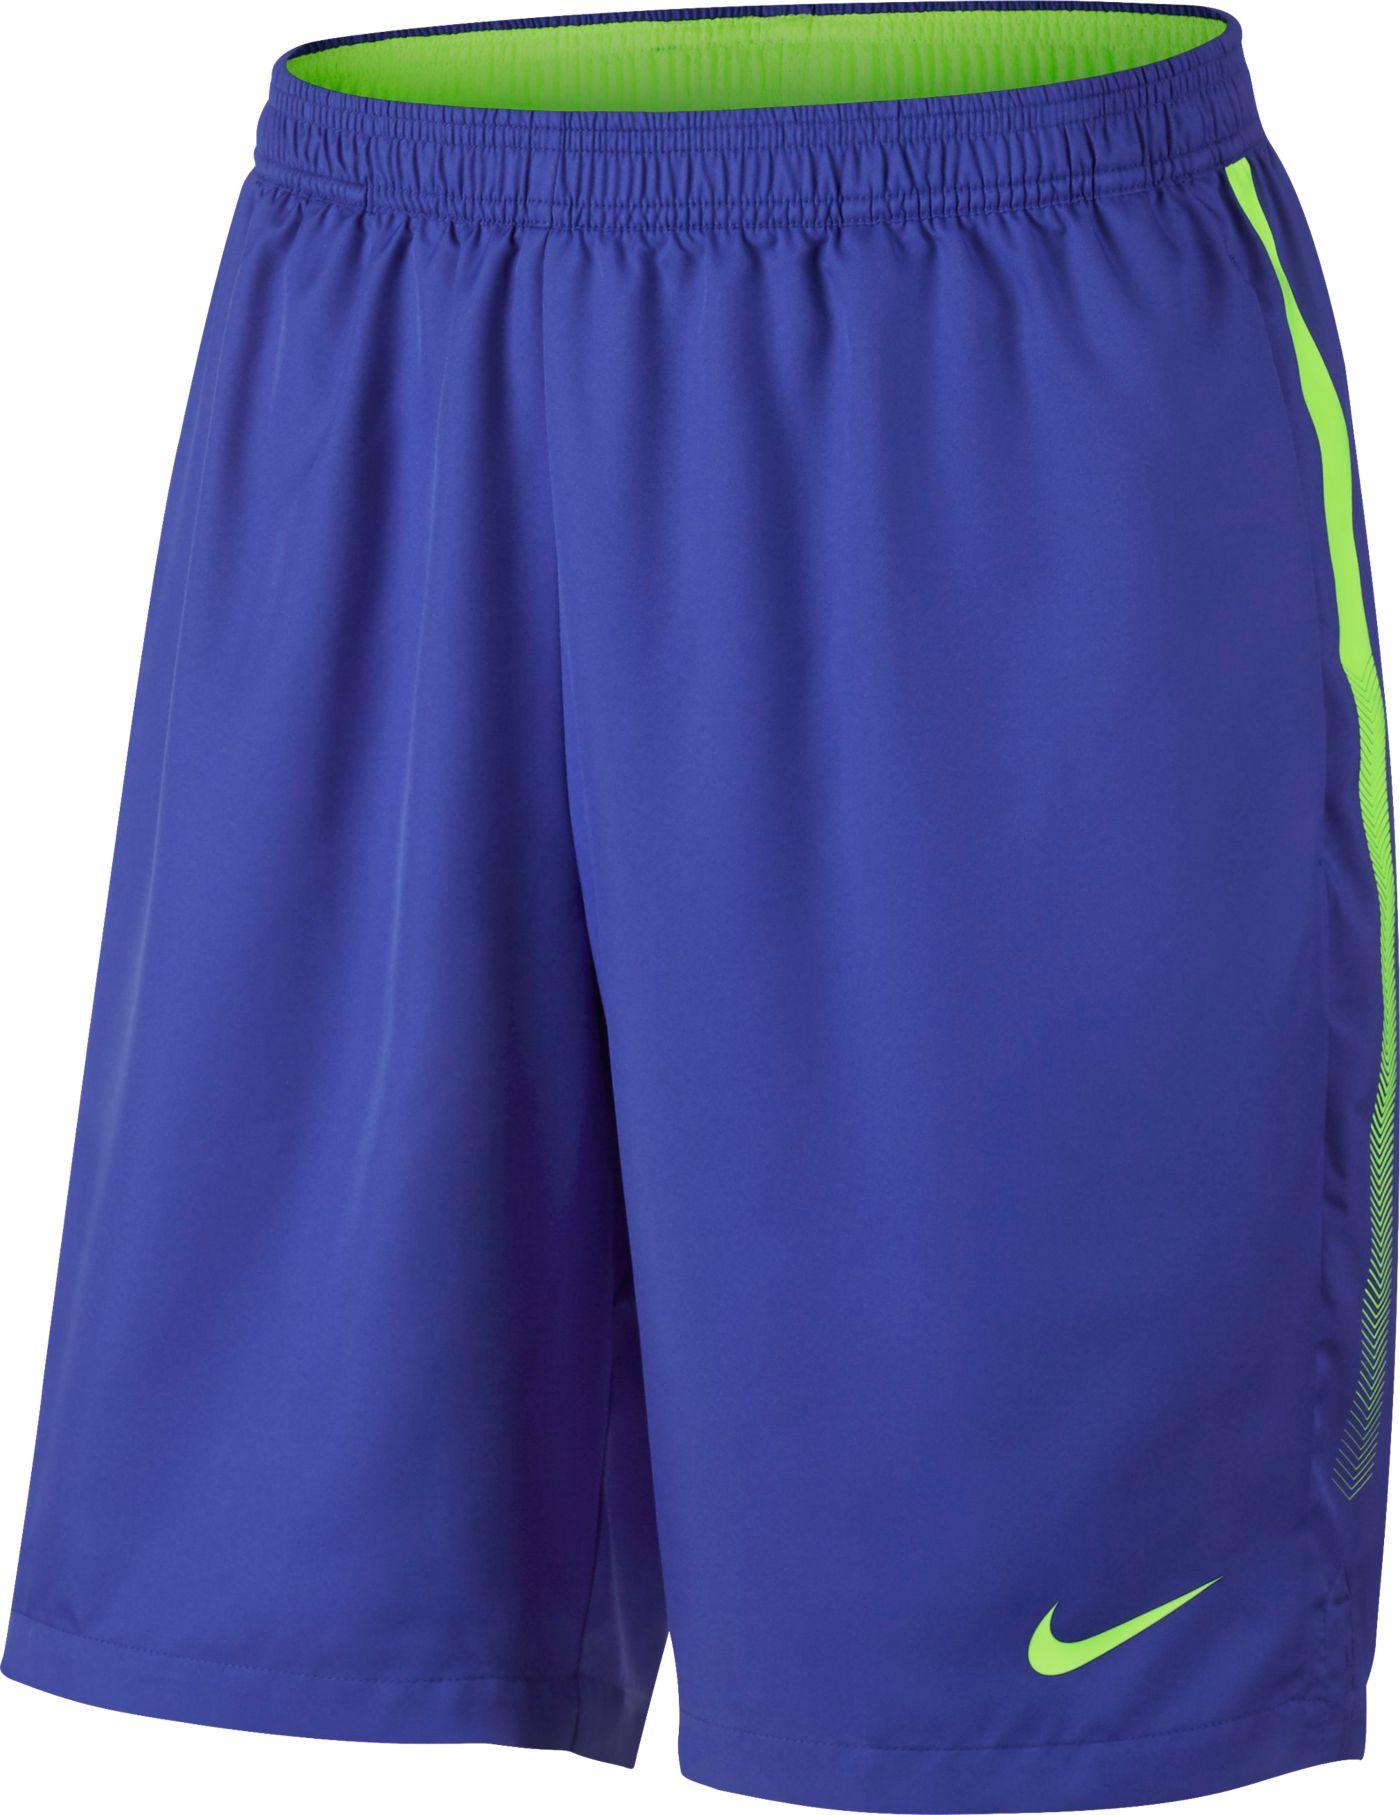 Nike Men's Court Dry 9'' Tennis Shorts